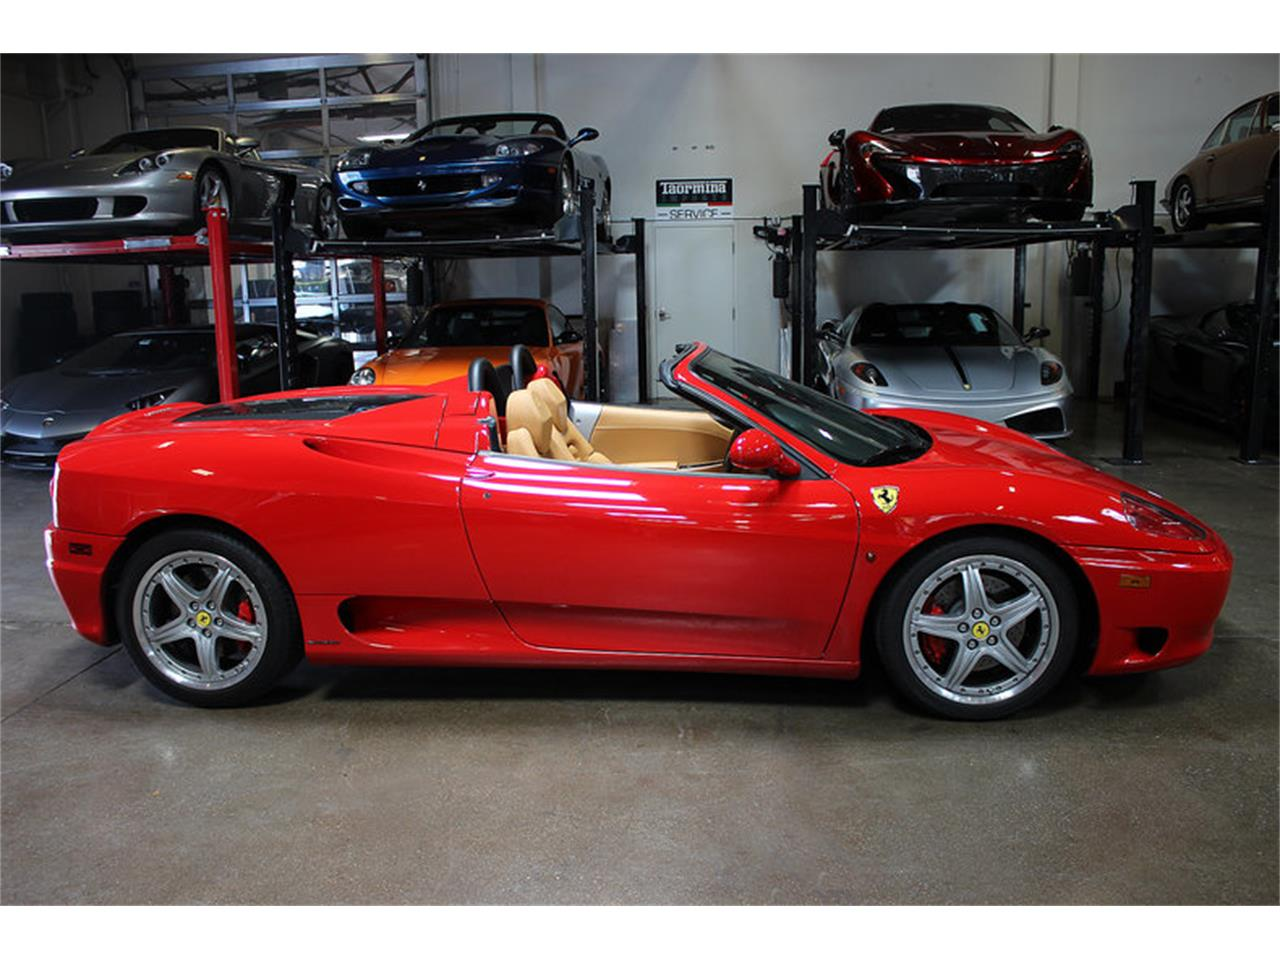 Large Picture of '04 Ferrari 360 located in California - $149,995.00 - LSDU